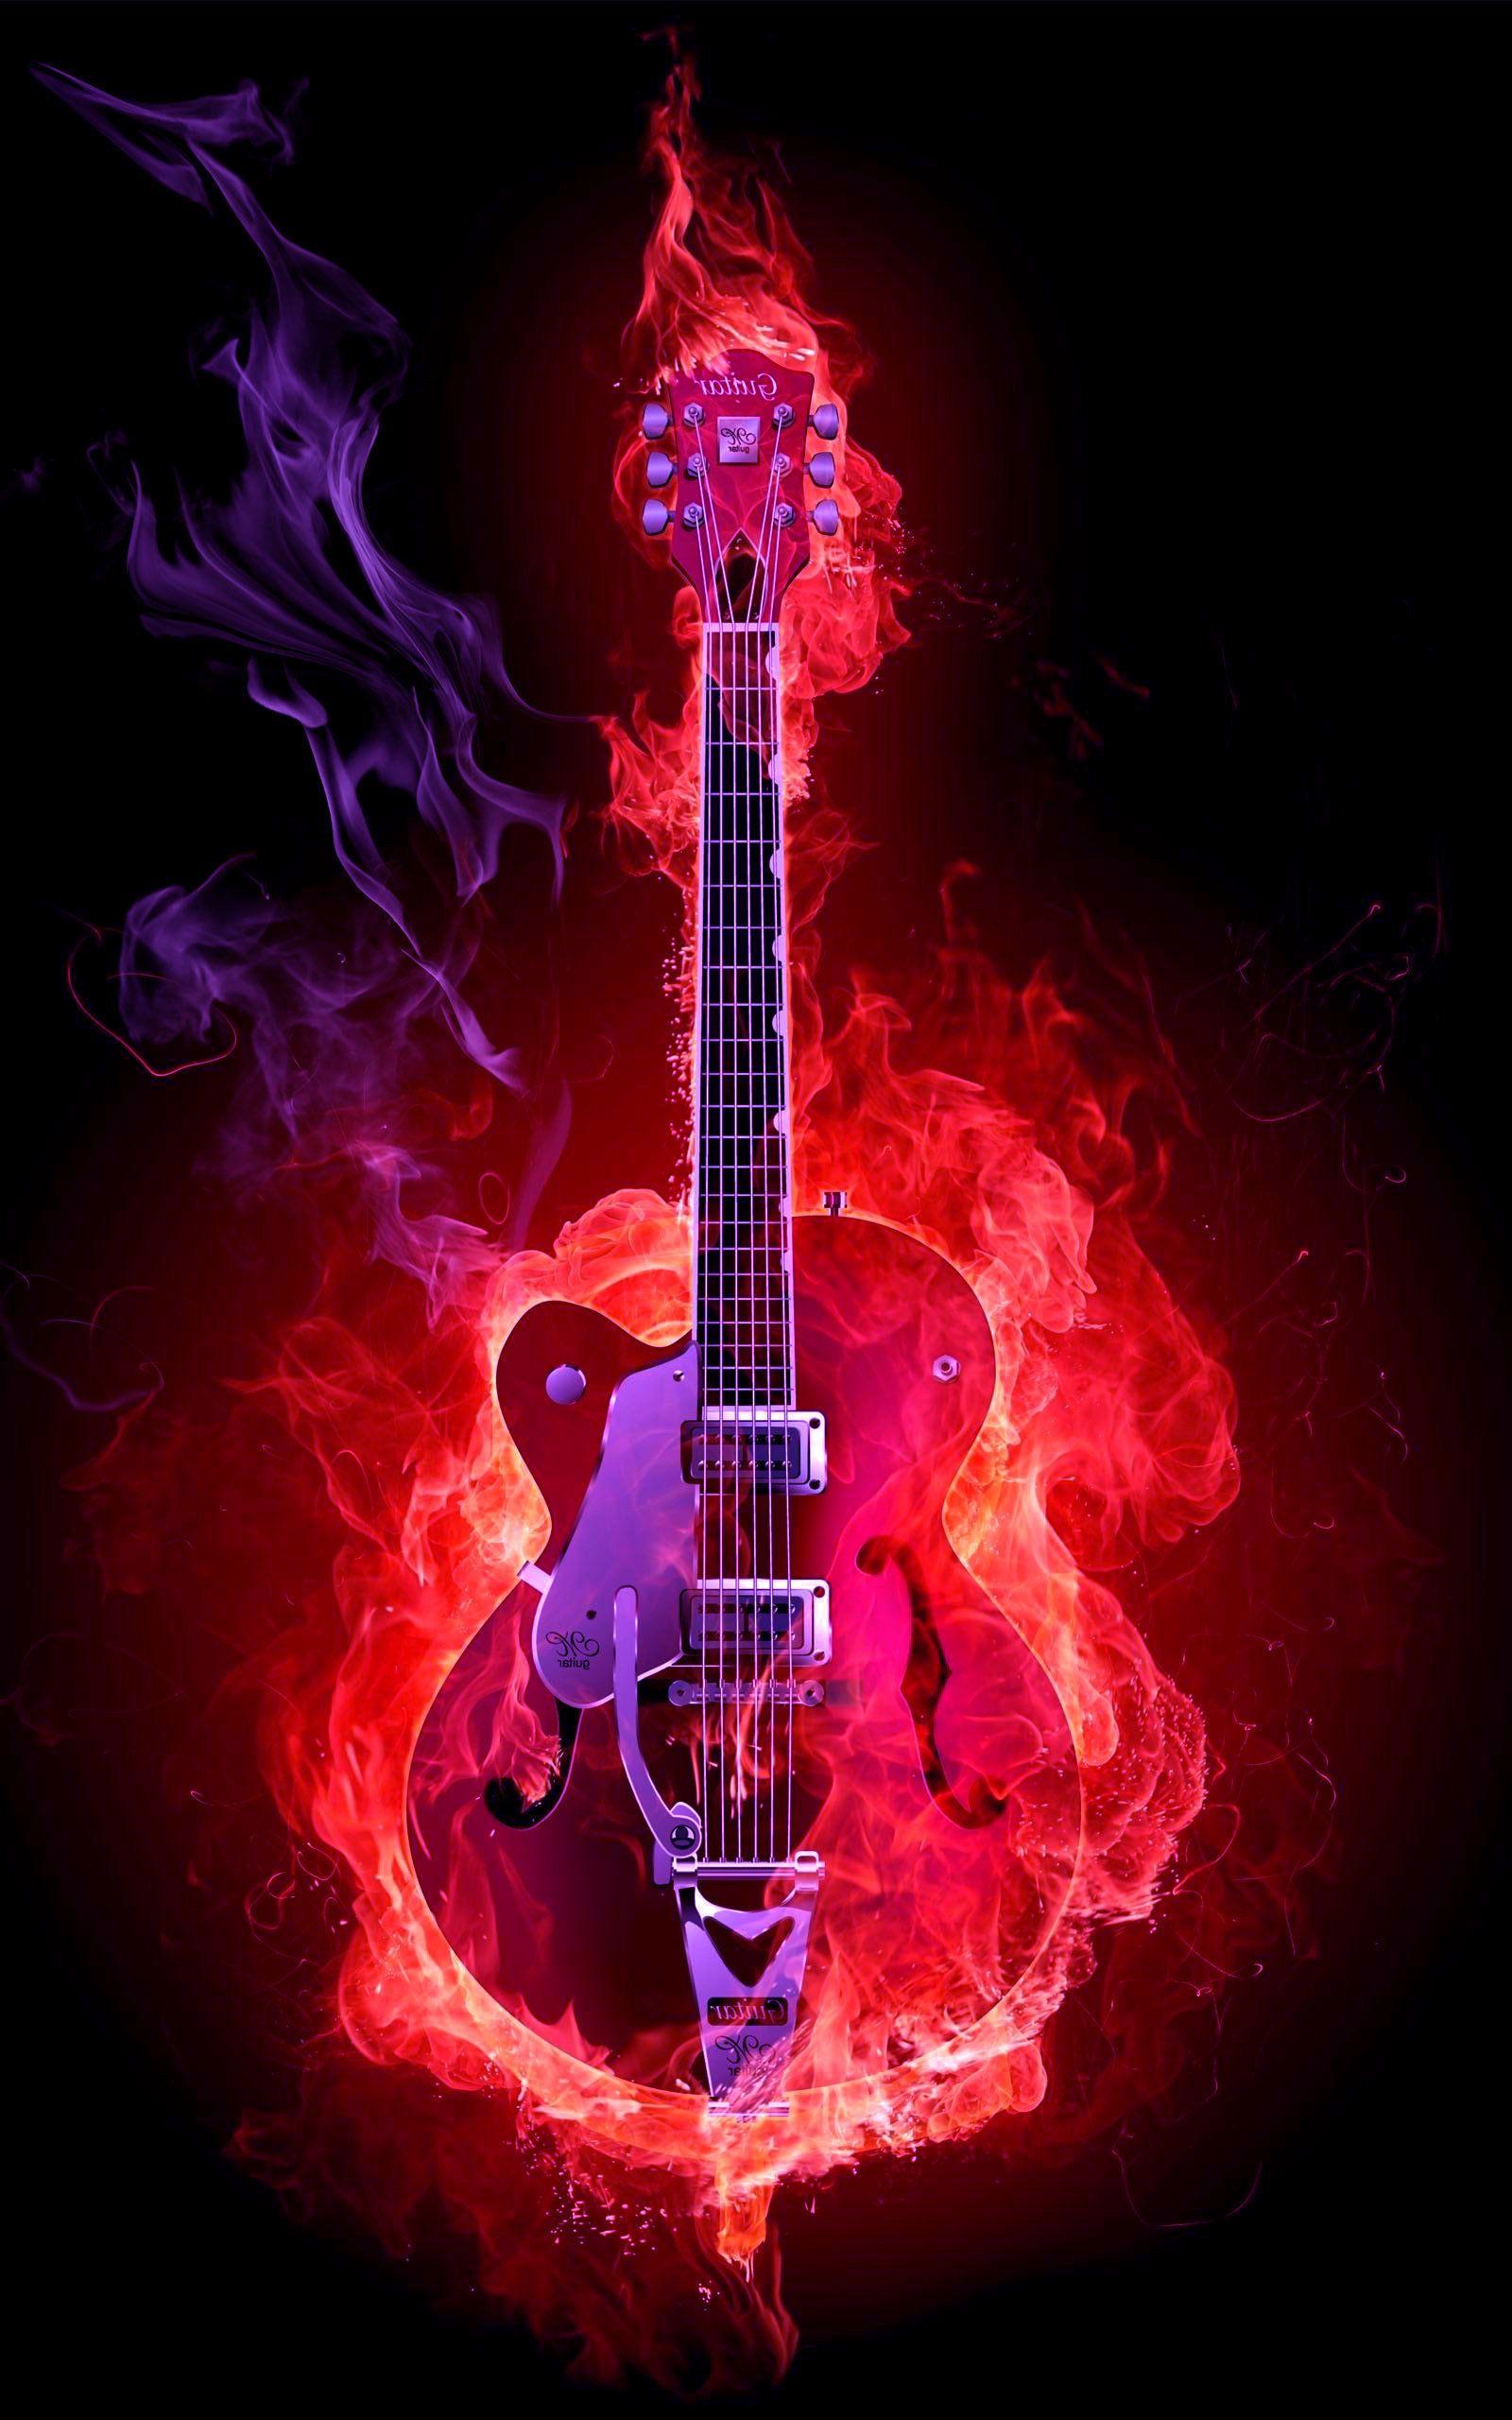 Flame Guitar Hd Wallpaper 1600x2560 High Definition Wallpaper Daily Screens Id 3331